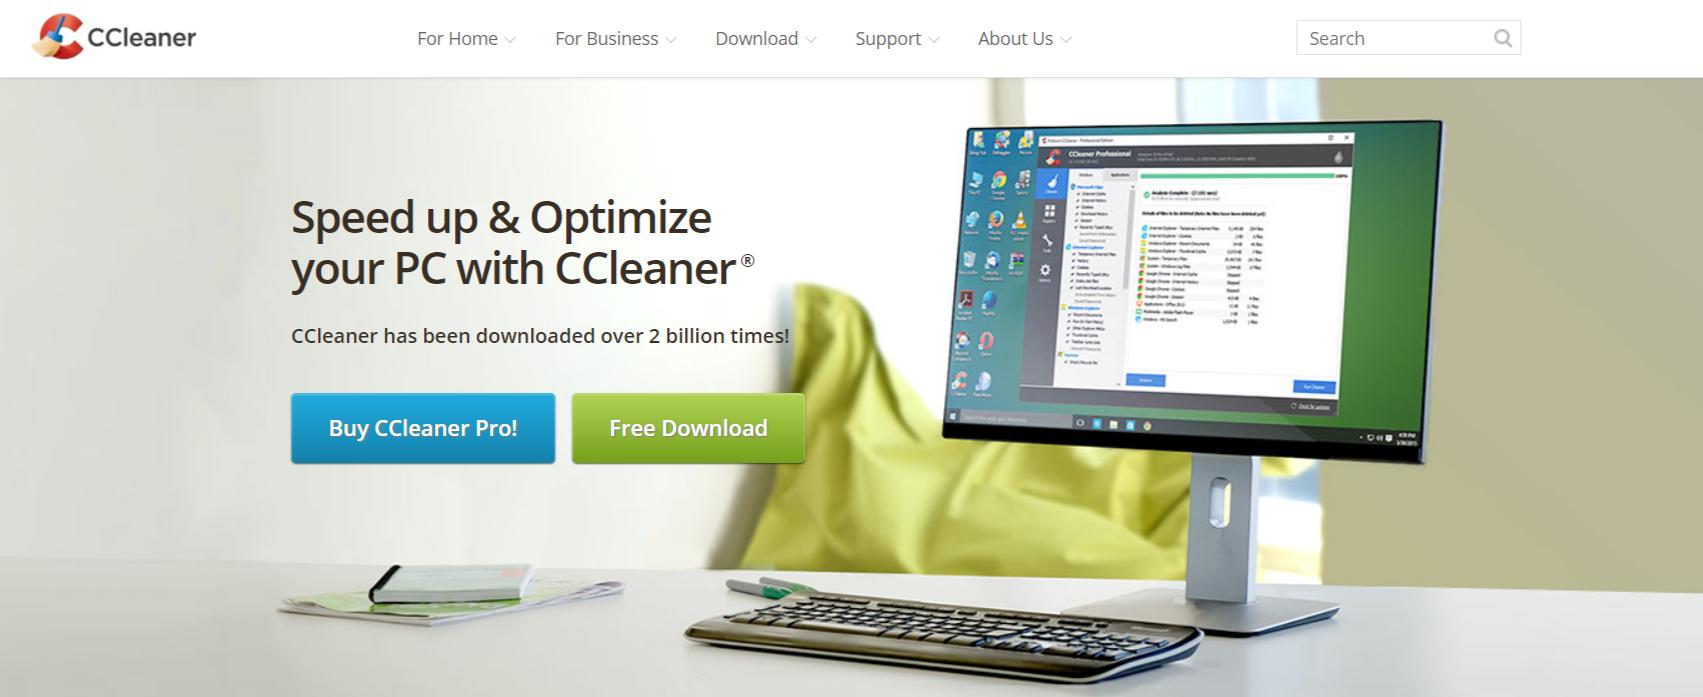 CCleaner- make a laptop run faster